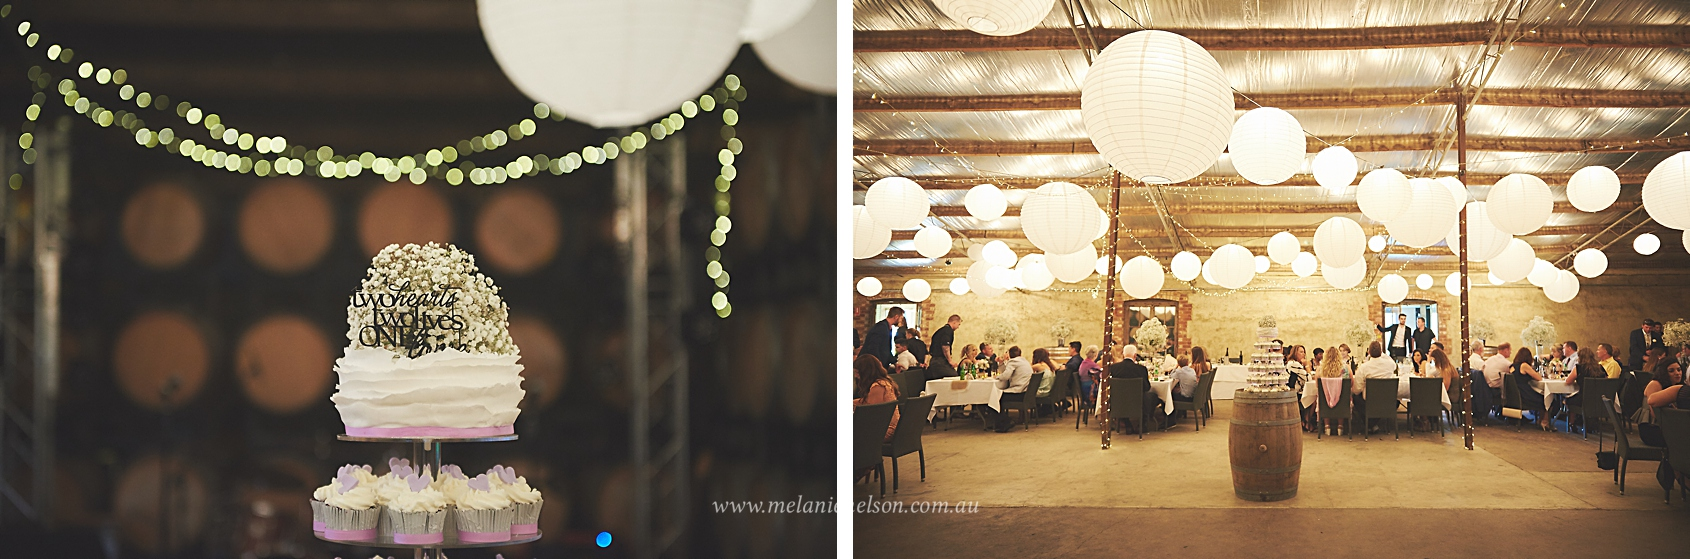 bird_in_hand_wedding_photos_002.jpg